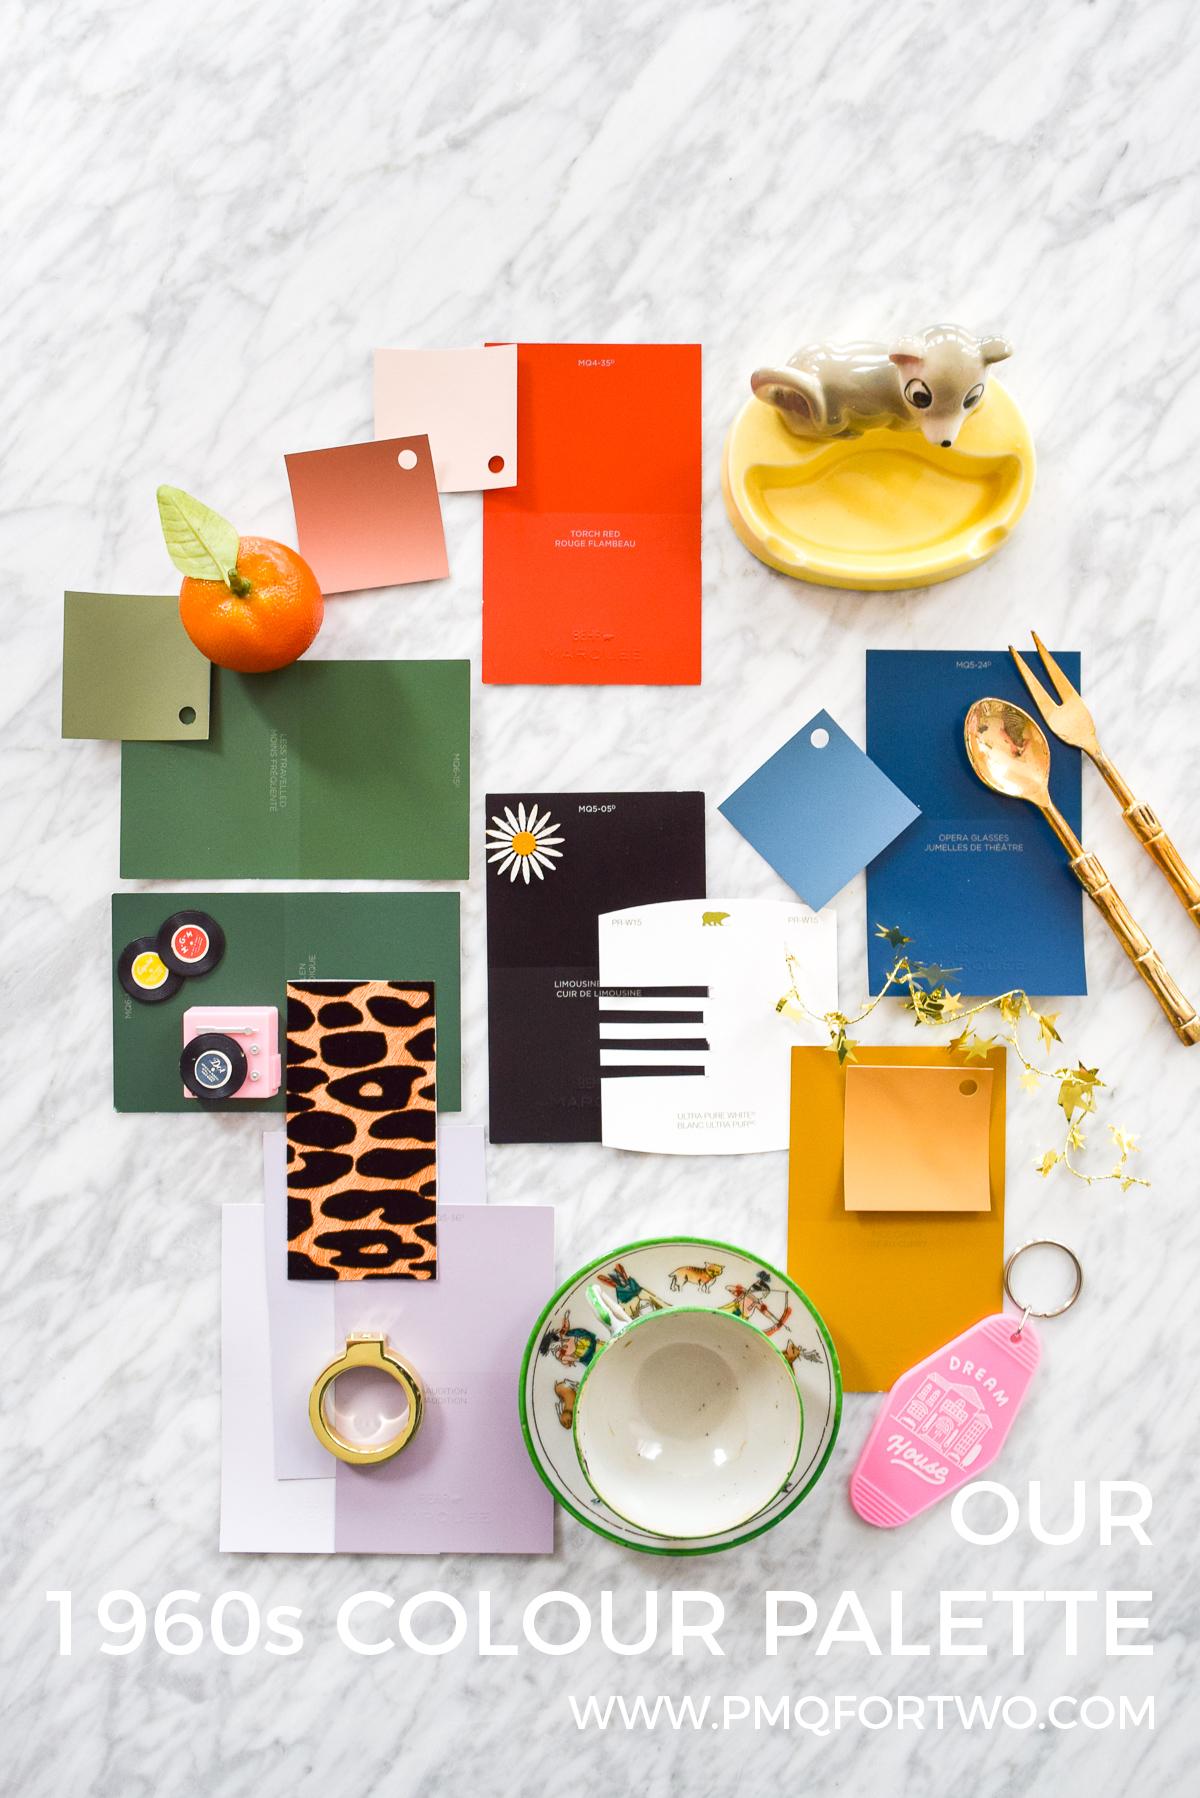 a flat lay colour palette